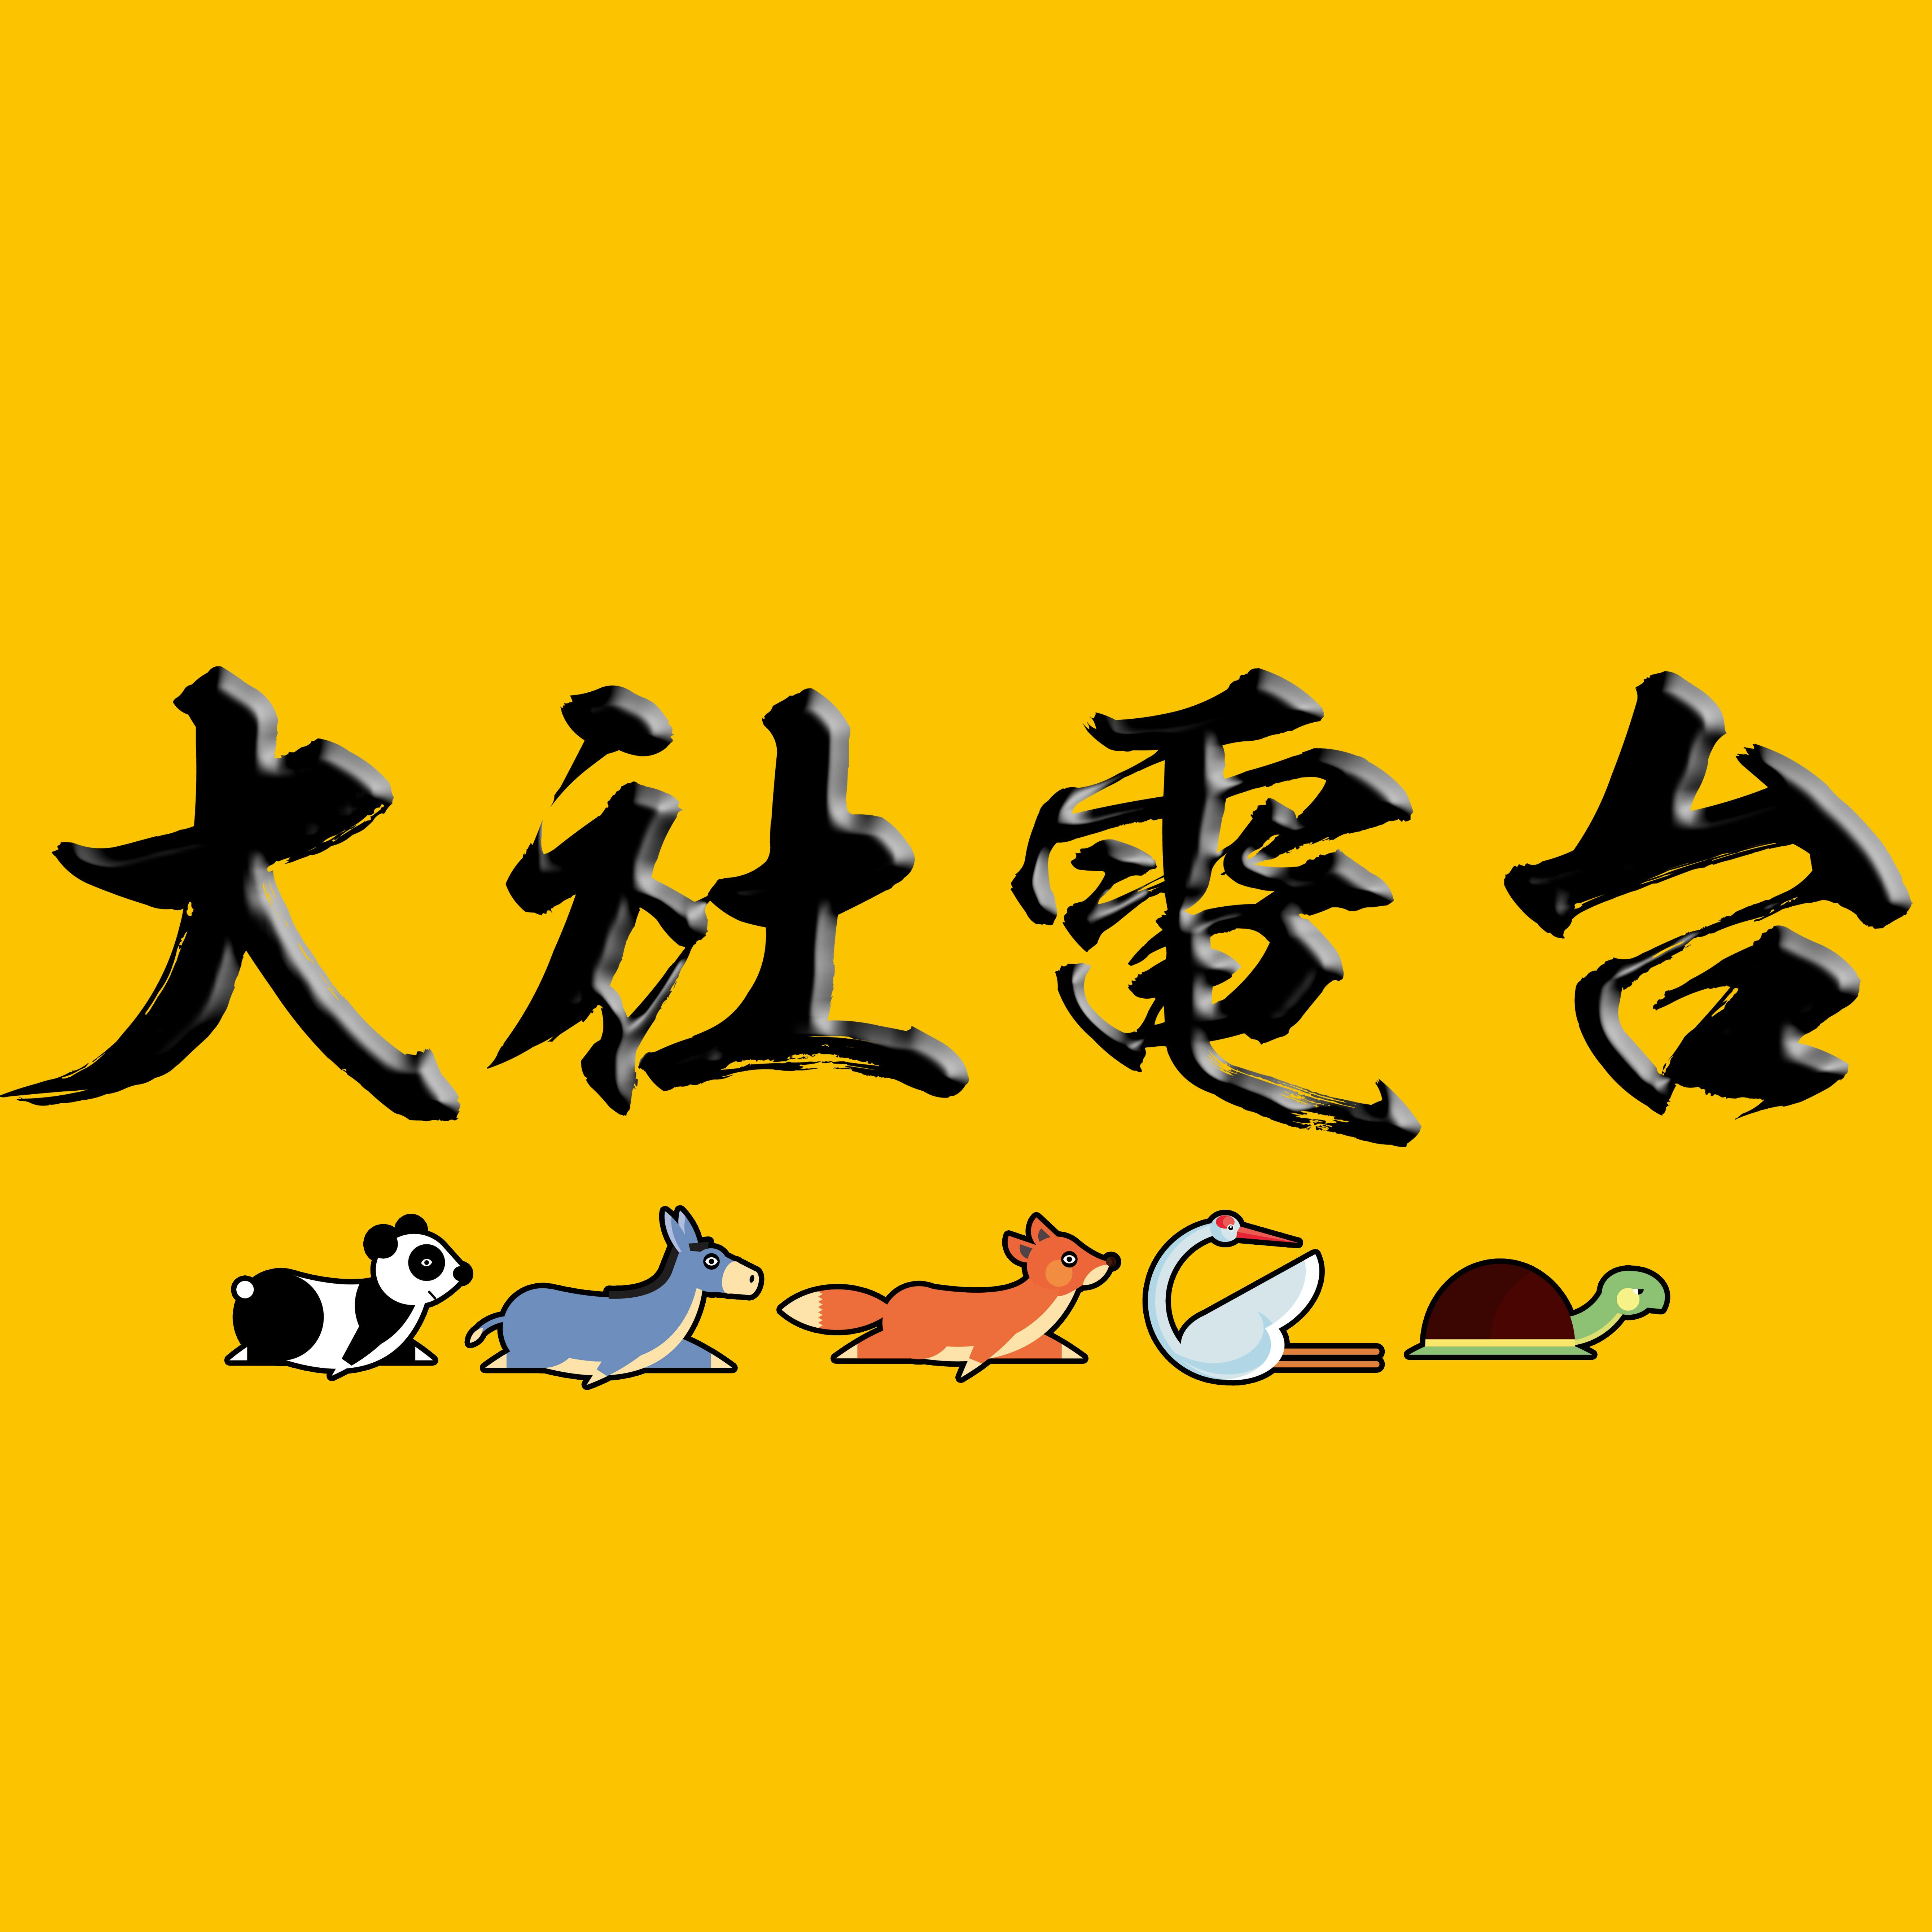 <![CDATA[大家一起社•大社电台]]>